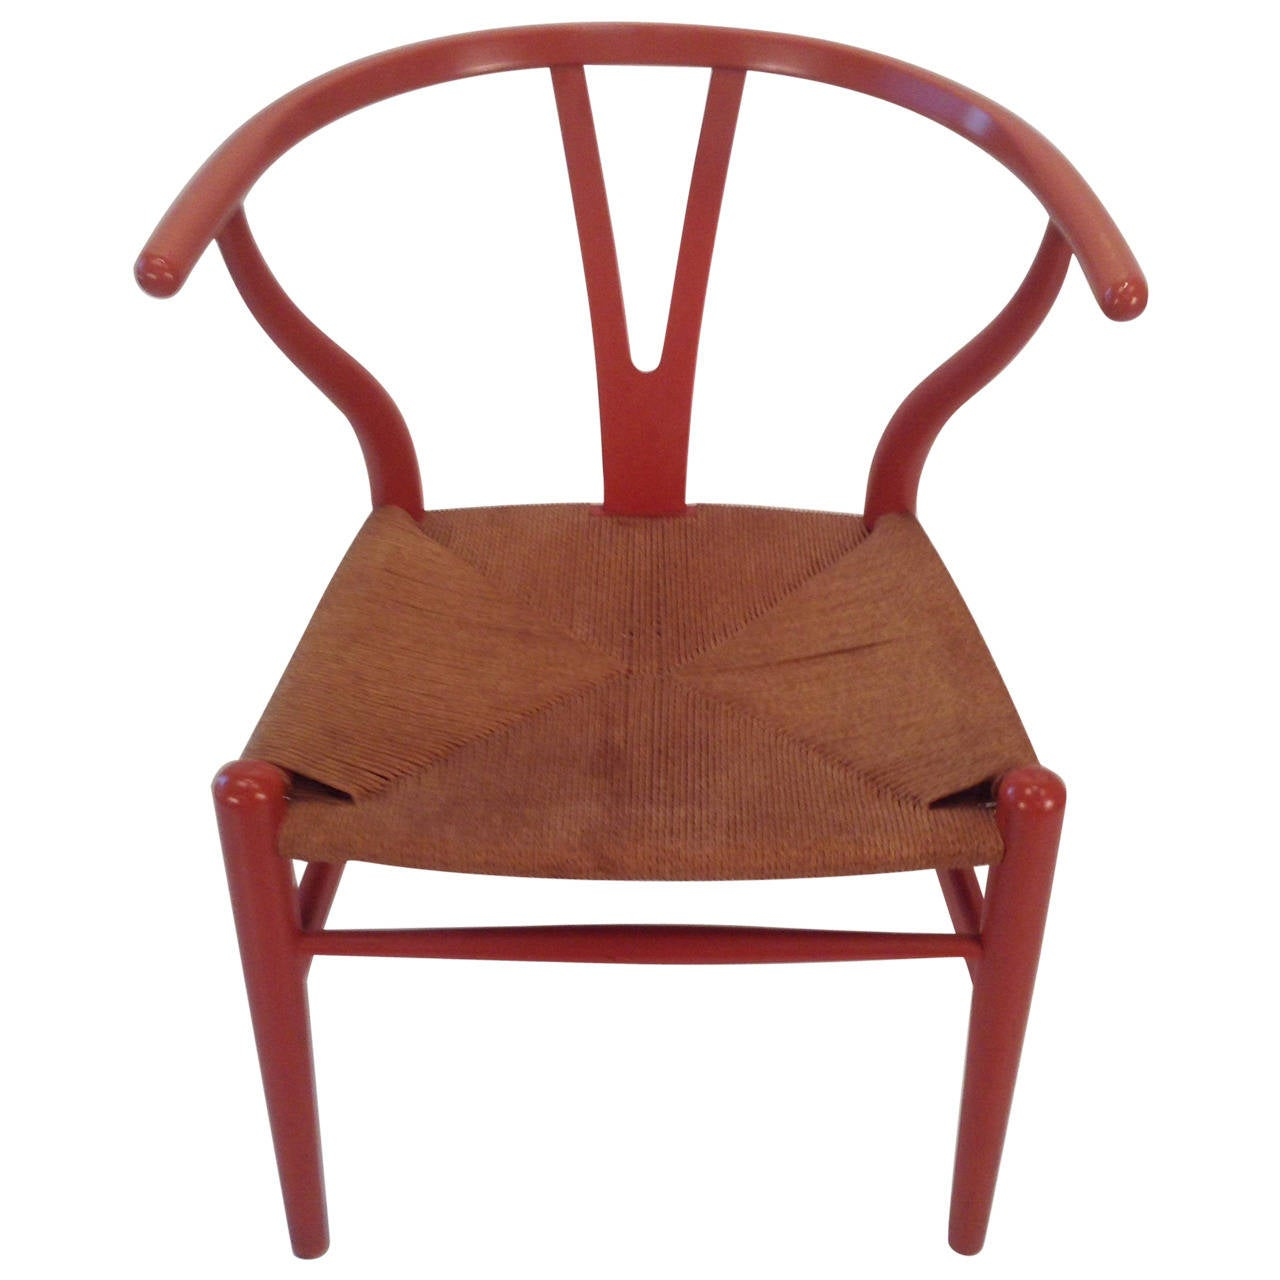 Early Original Hans Wegner Wishbone,,Y Chair,, Carl Hansen, Denmark